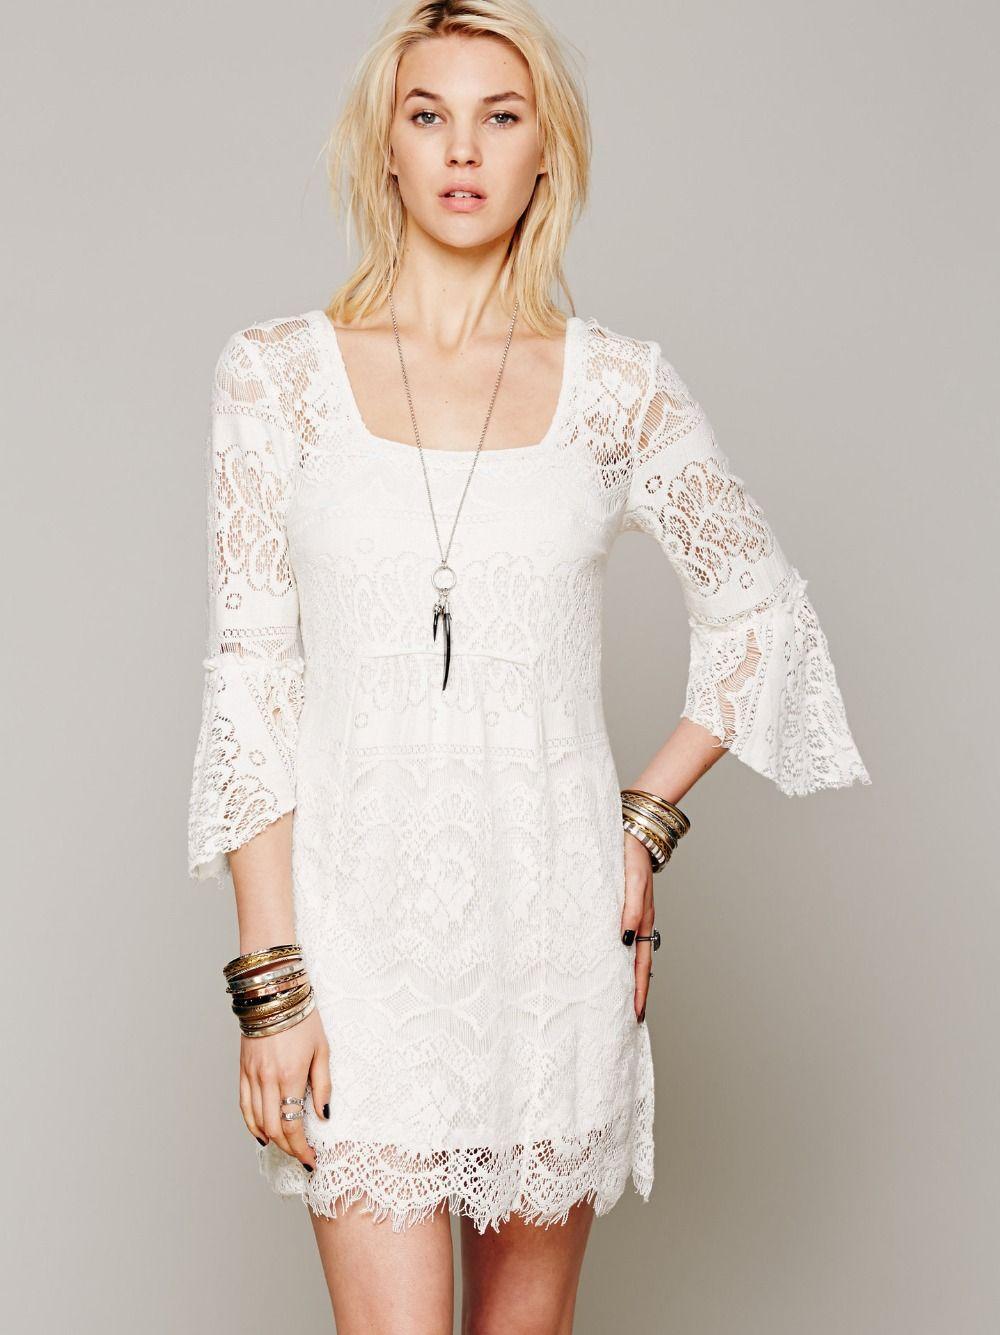 Free people white lace v-neck long sleeve dress